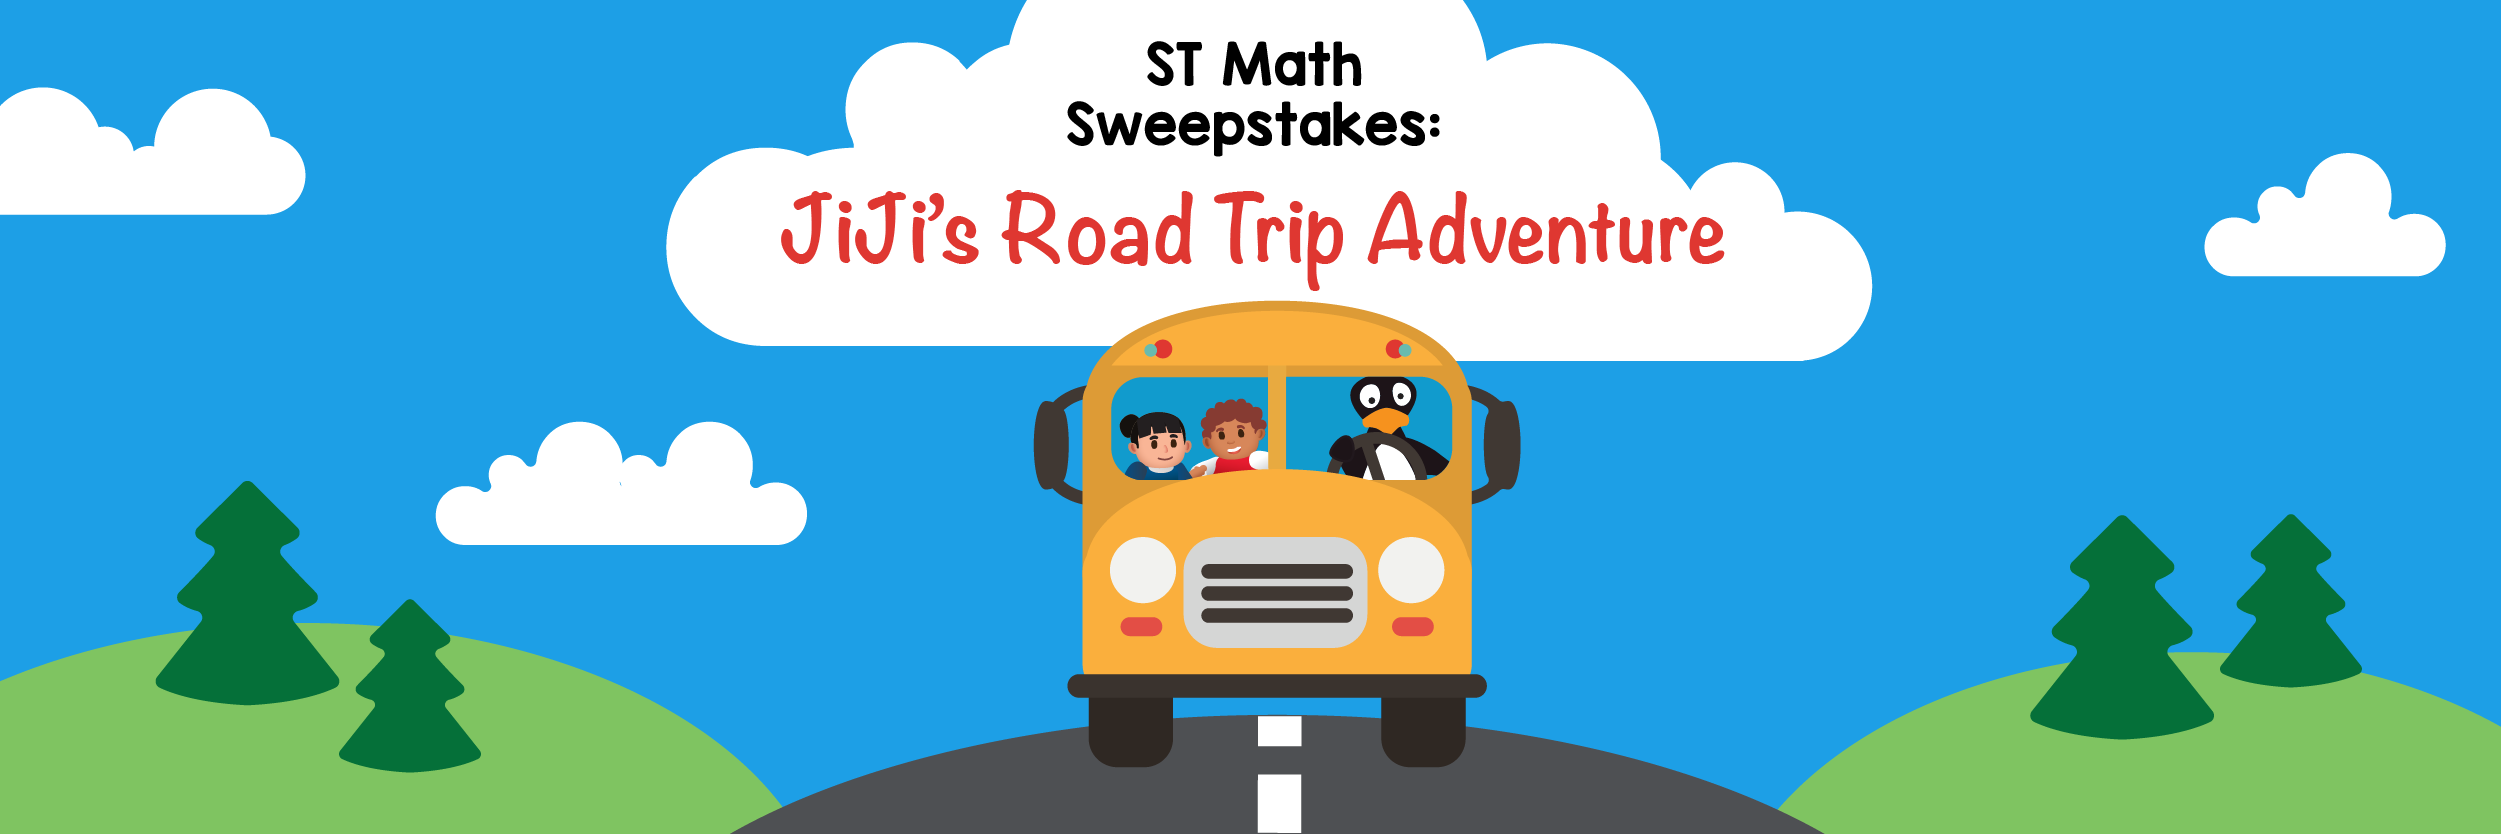 st-math-sweepstakes-jiji-road-trip-adventure